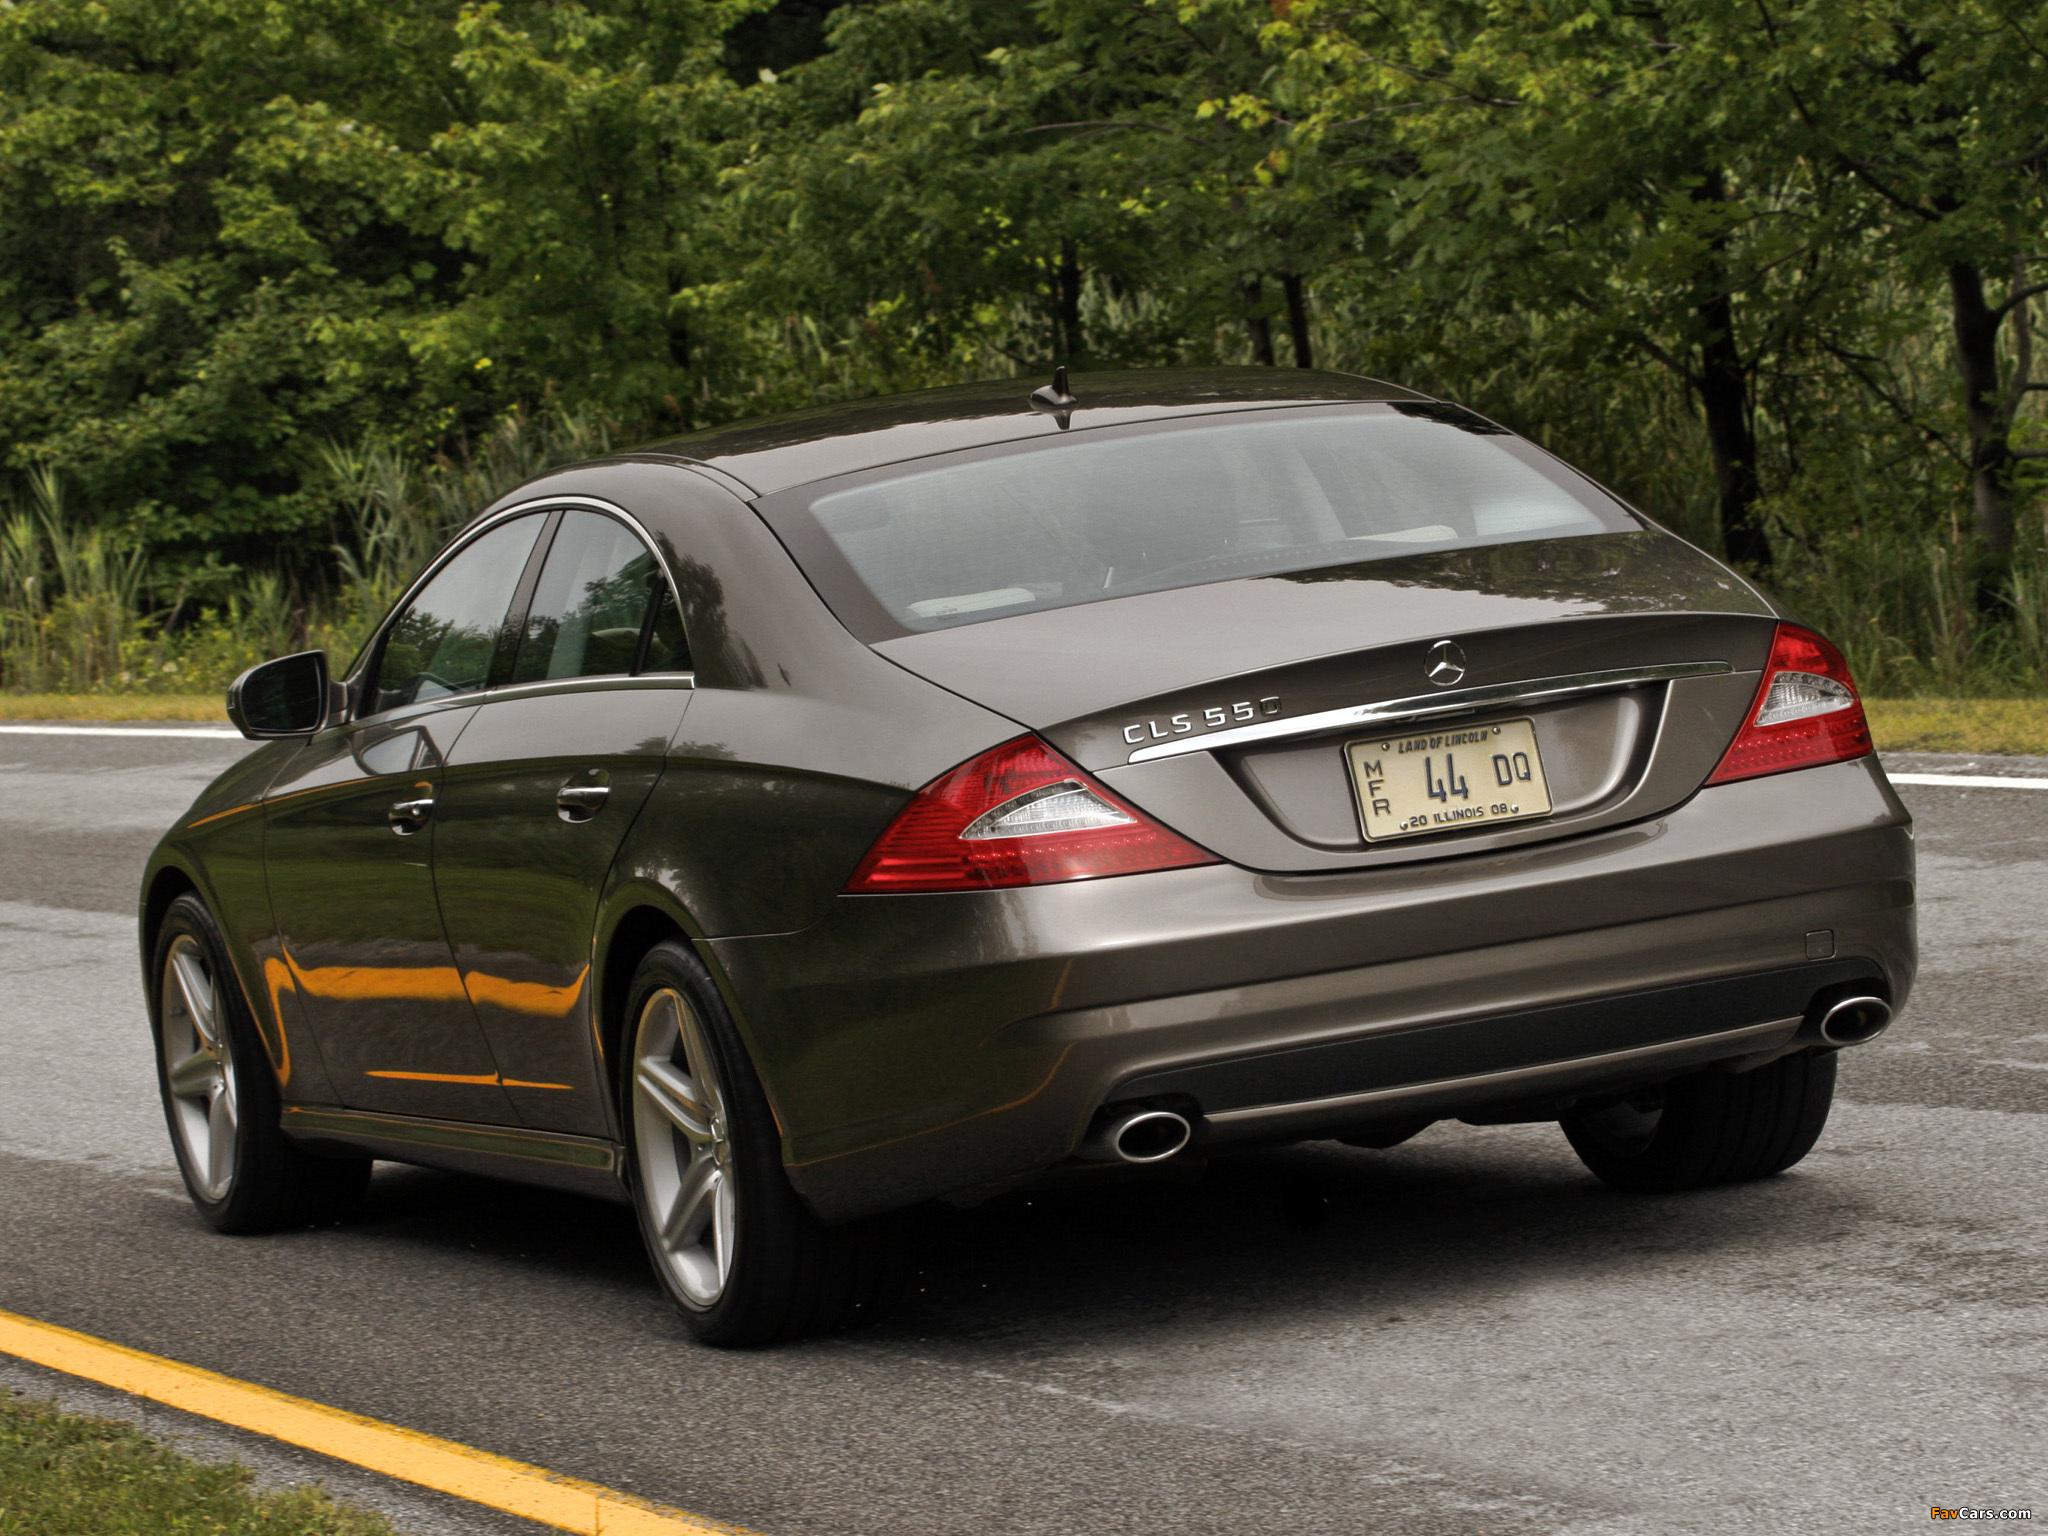 Mercedes benz cls 550 c219 2007 10 images 2048x1536 for 2007 mercedes benz cl 550